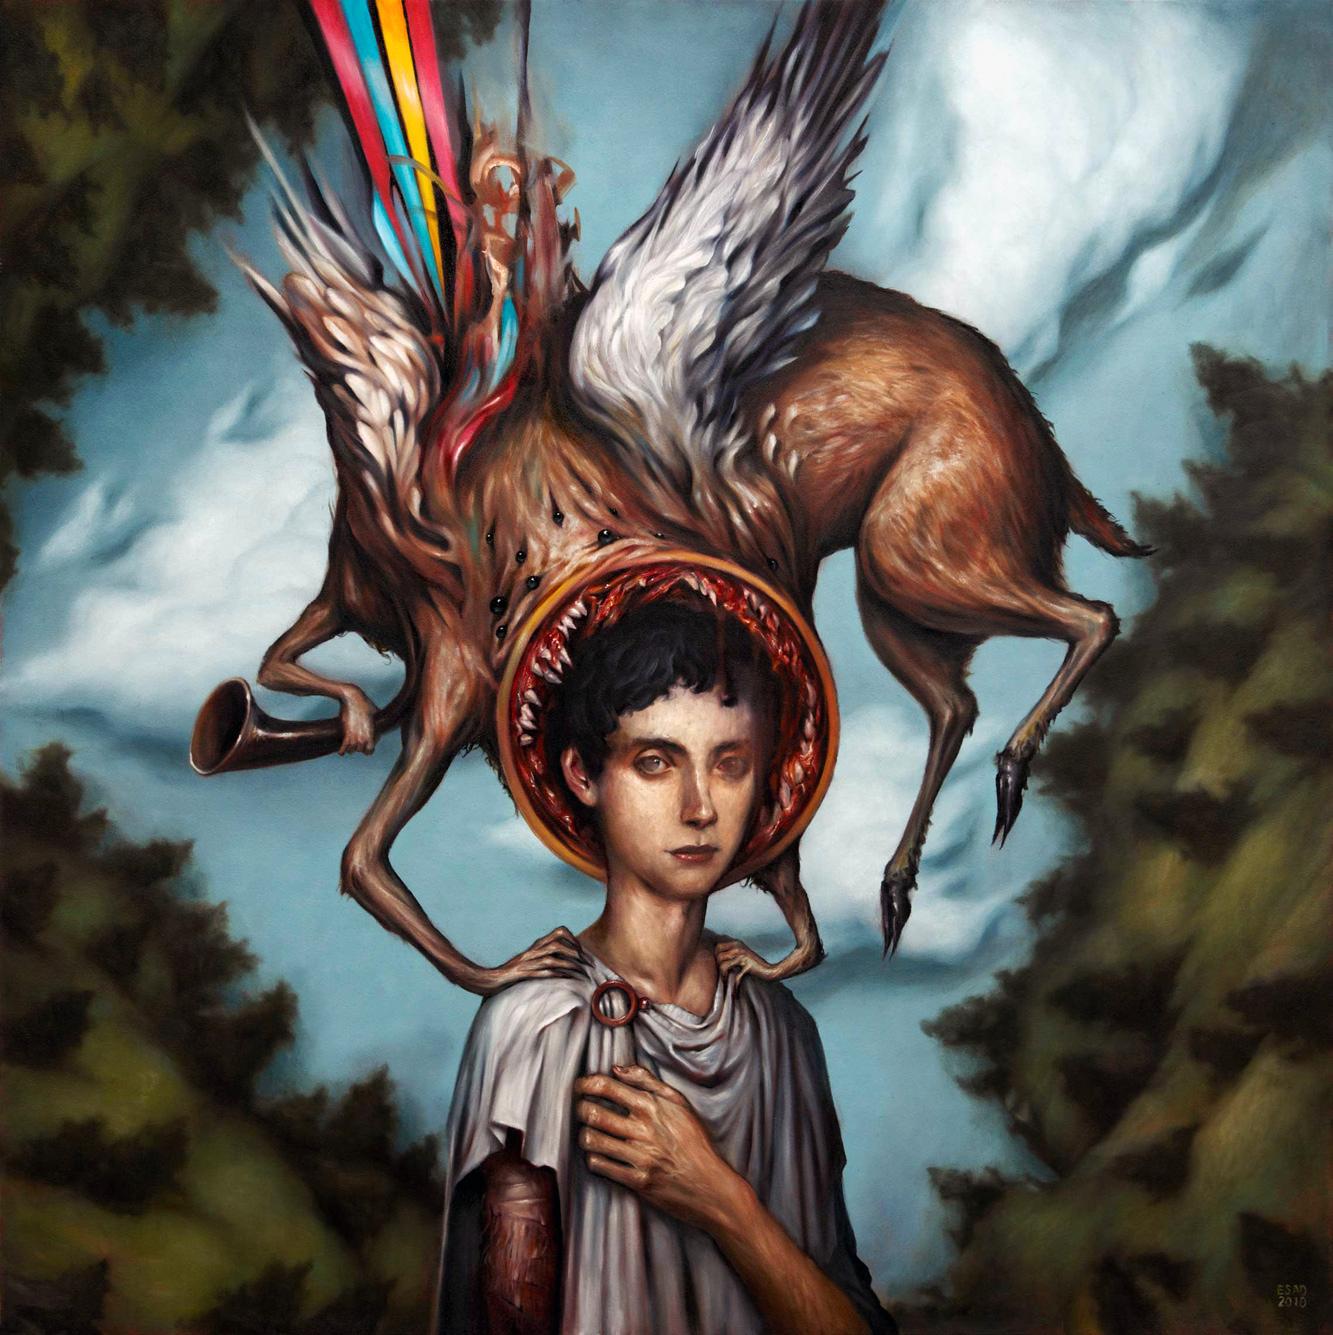 Blue Sky Noise - Album cover art for Circa Survive